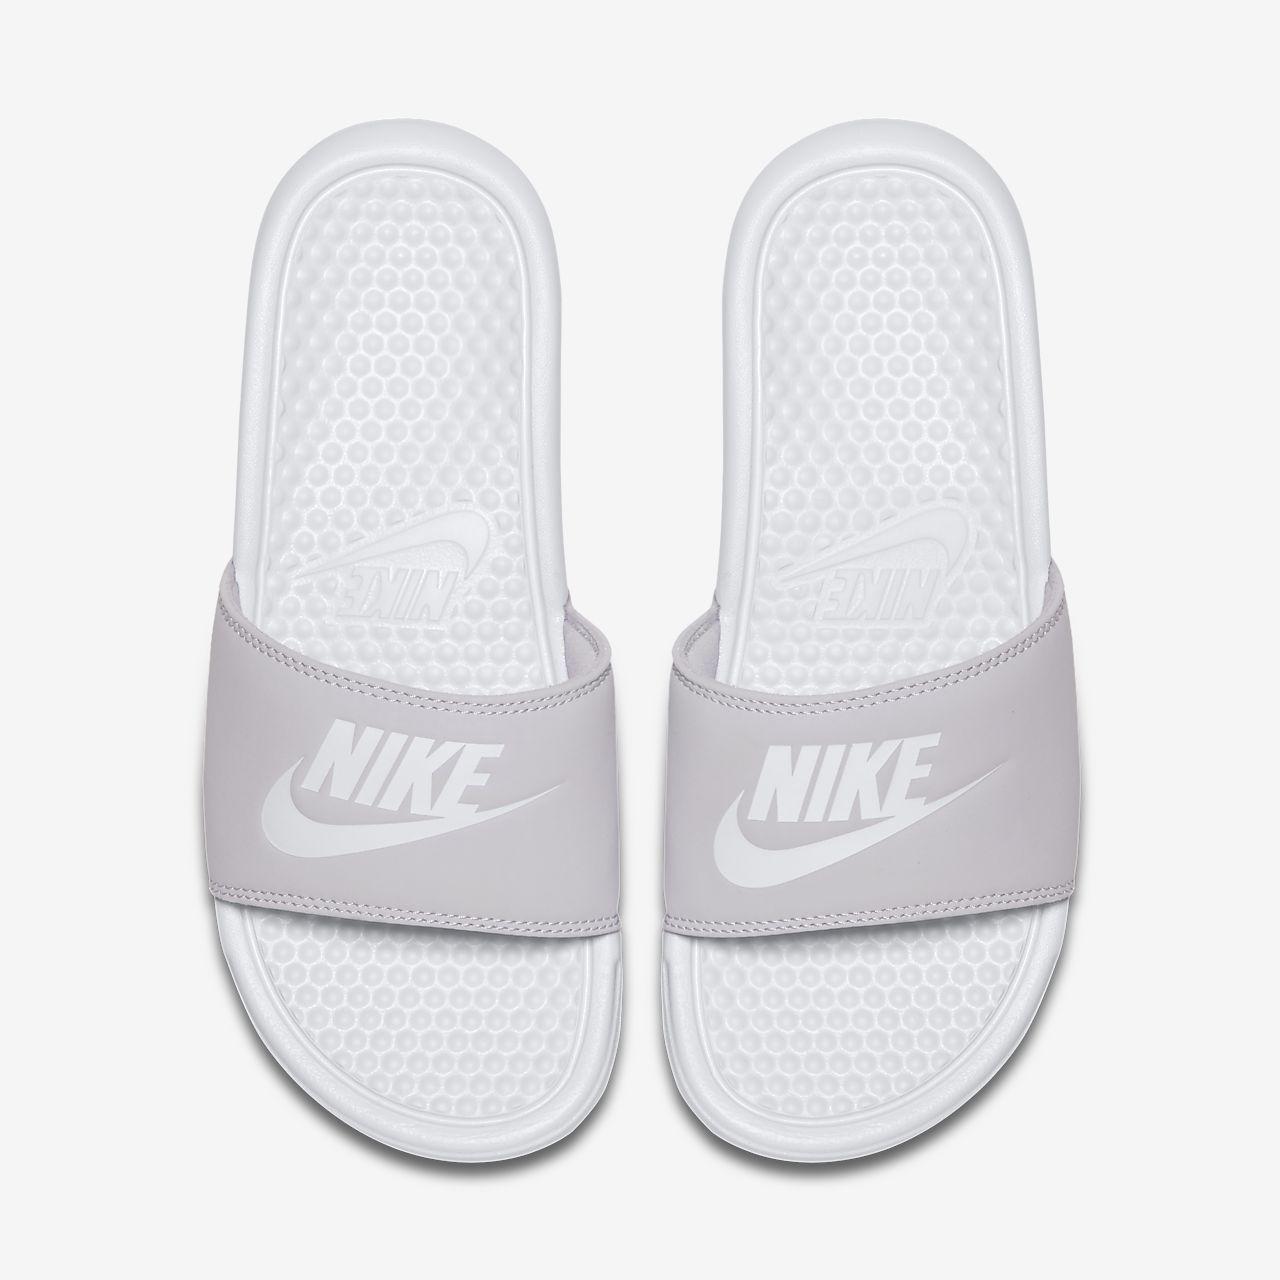 size 40 e429b fe135 ... Nike Benassi Pastel QS Women s Slide